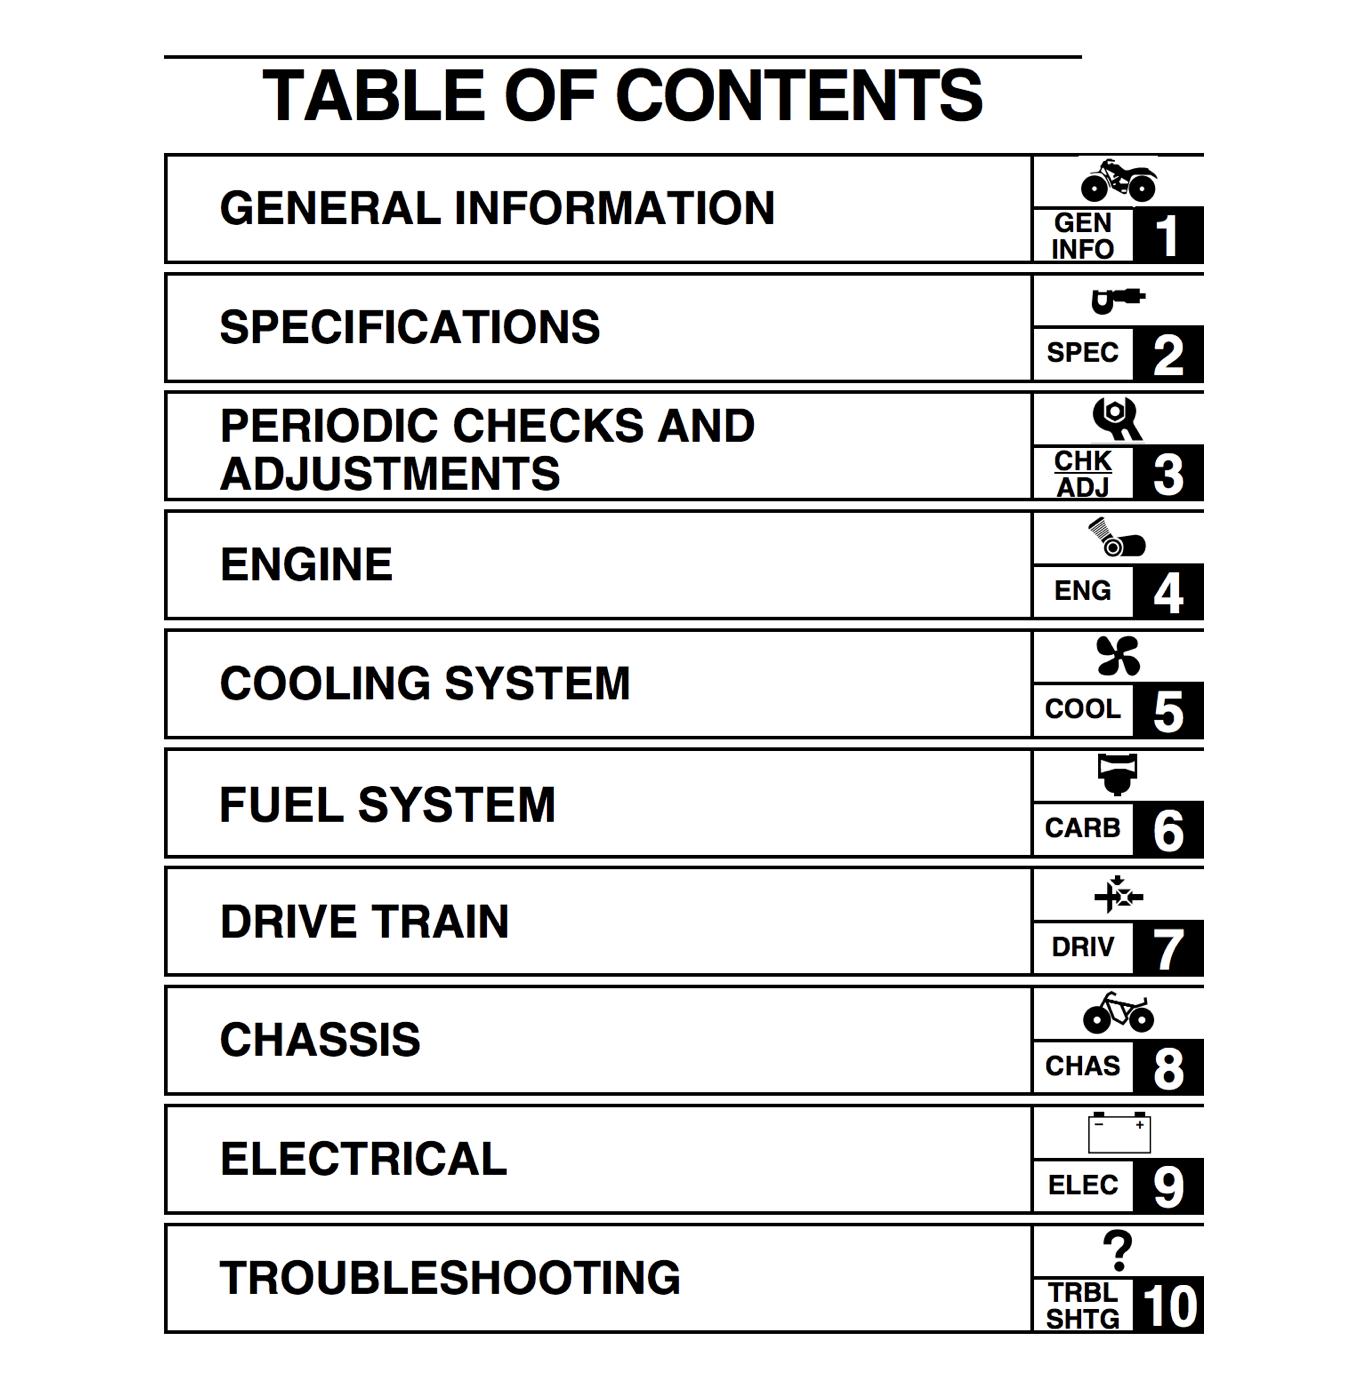 medium resolution of polaris sportsman 700 service manual chapters